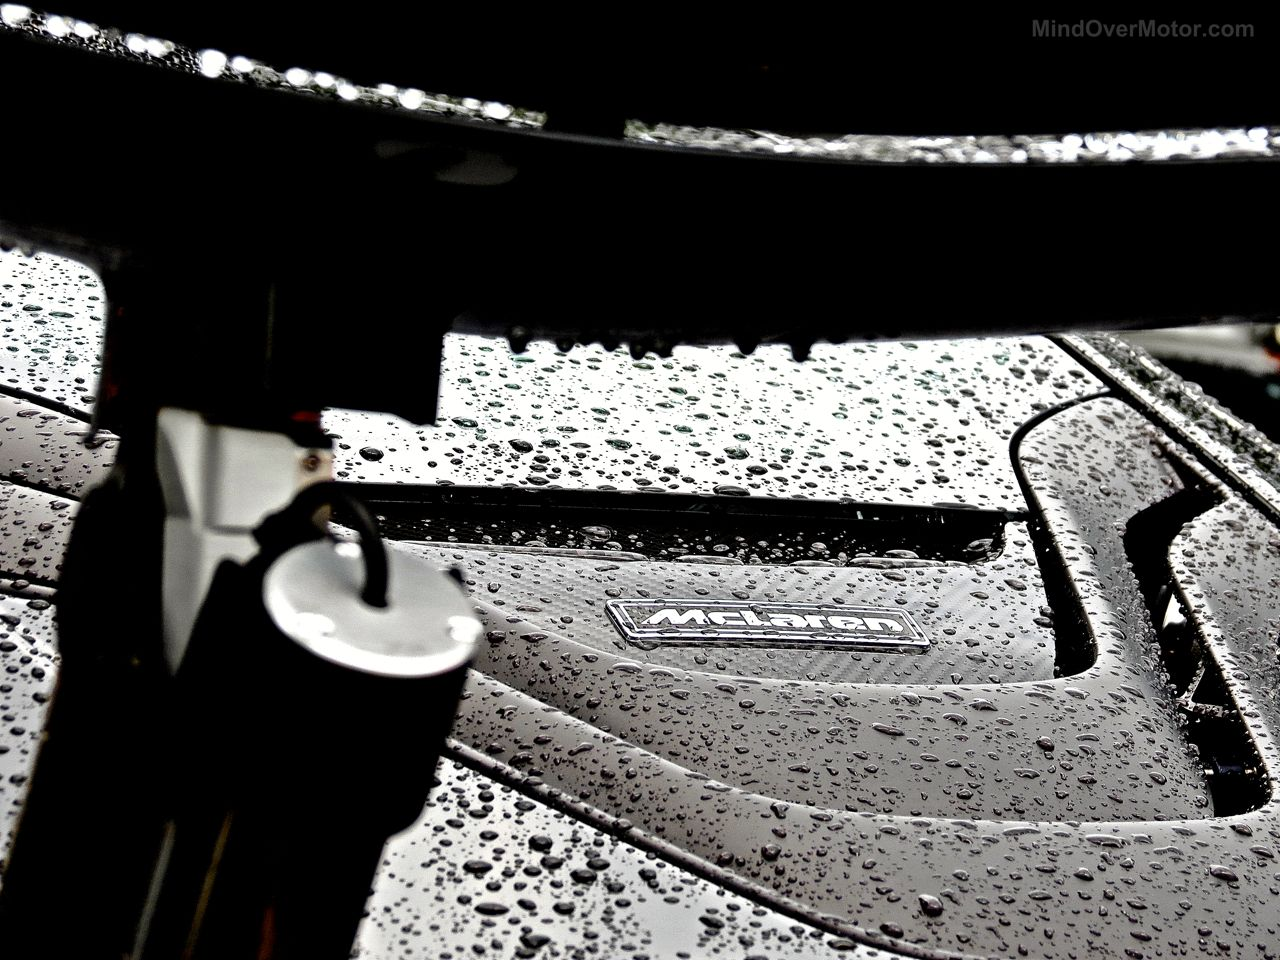 Greenwich 2 McLaren P1 Wet